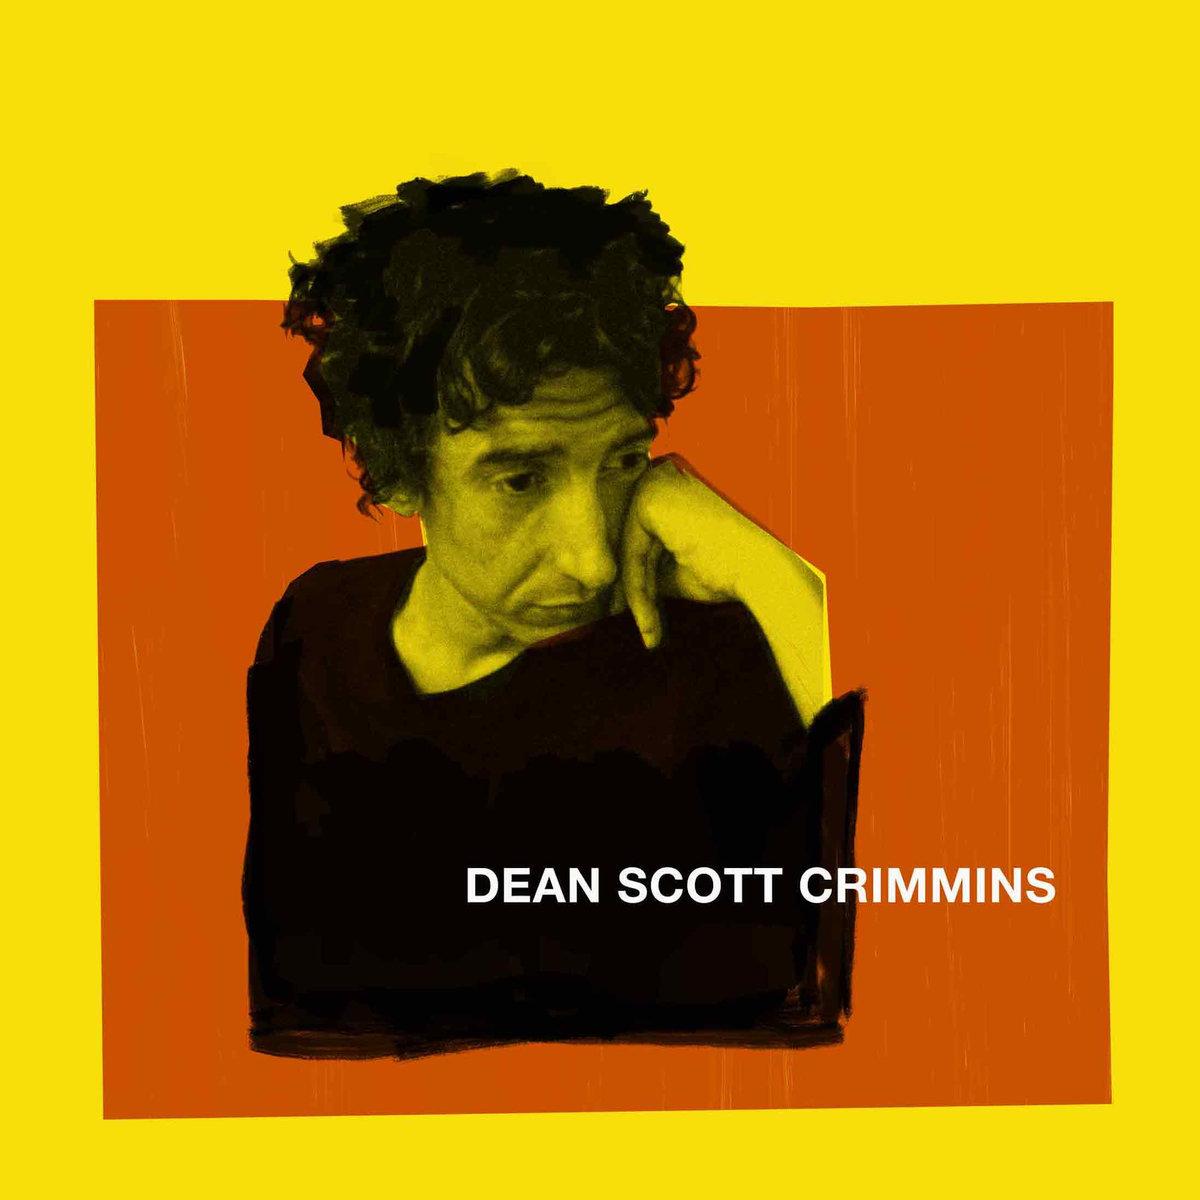 Dean Scott Crimmins (2018, recorded 2017) by Dean Scott Crimmins